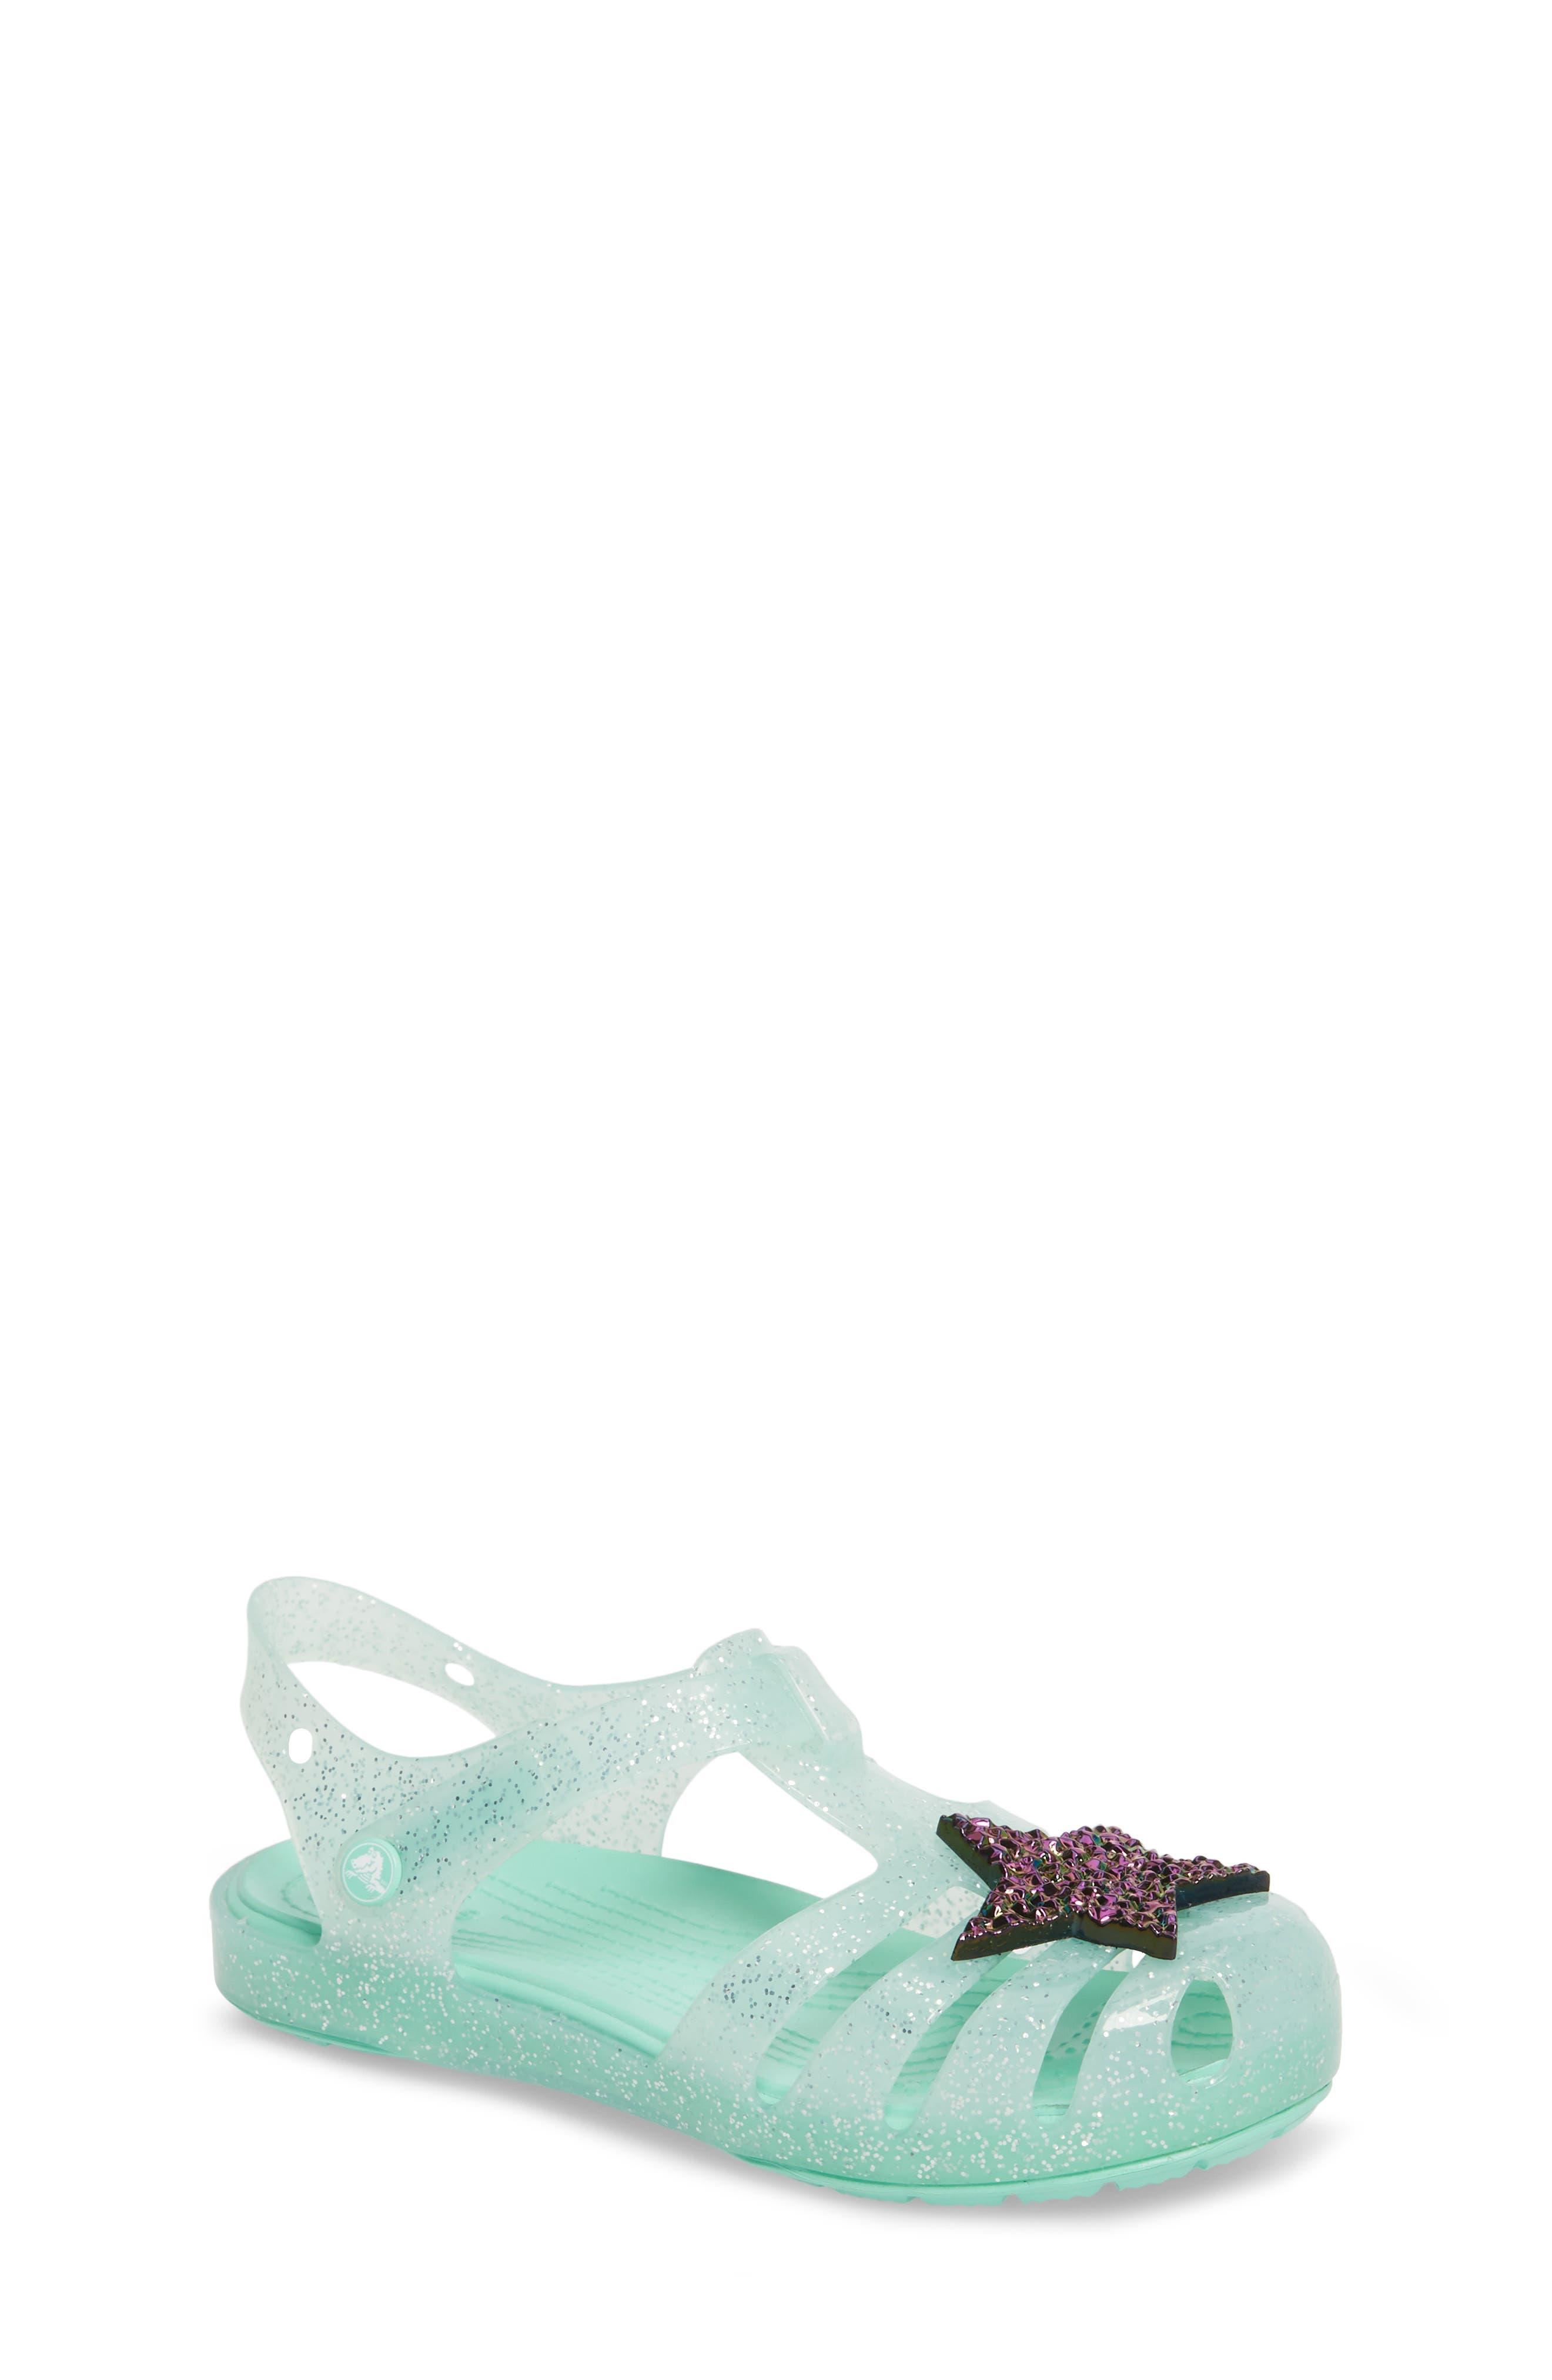 CROCS™ Isabella Glitter Fisherman Sandal (Baby, Walker, Toddler & Little Kid)